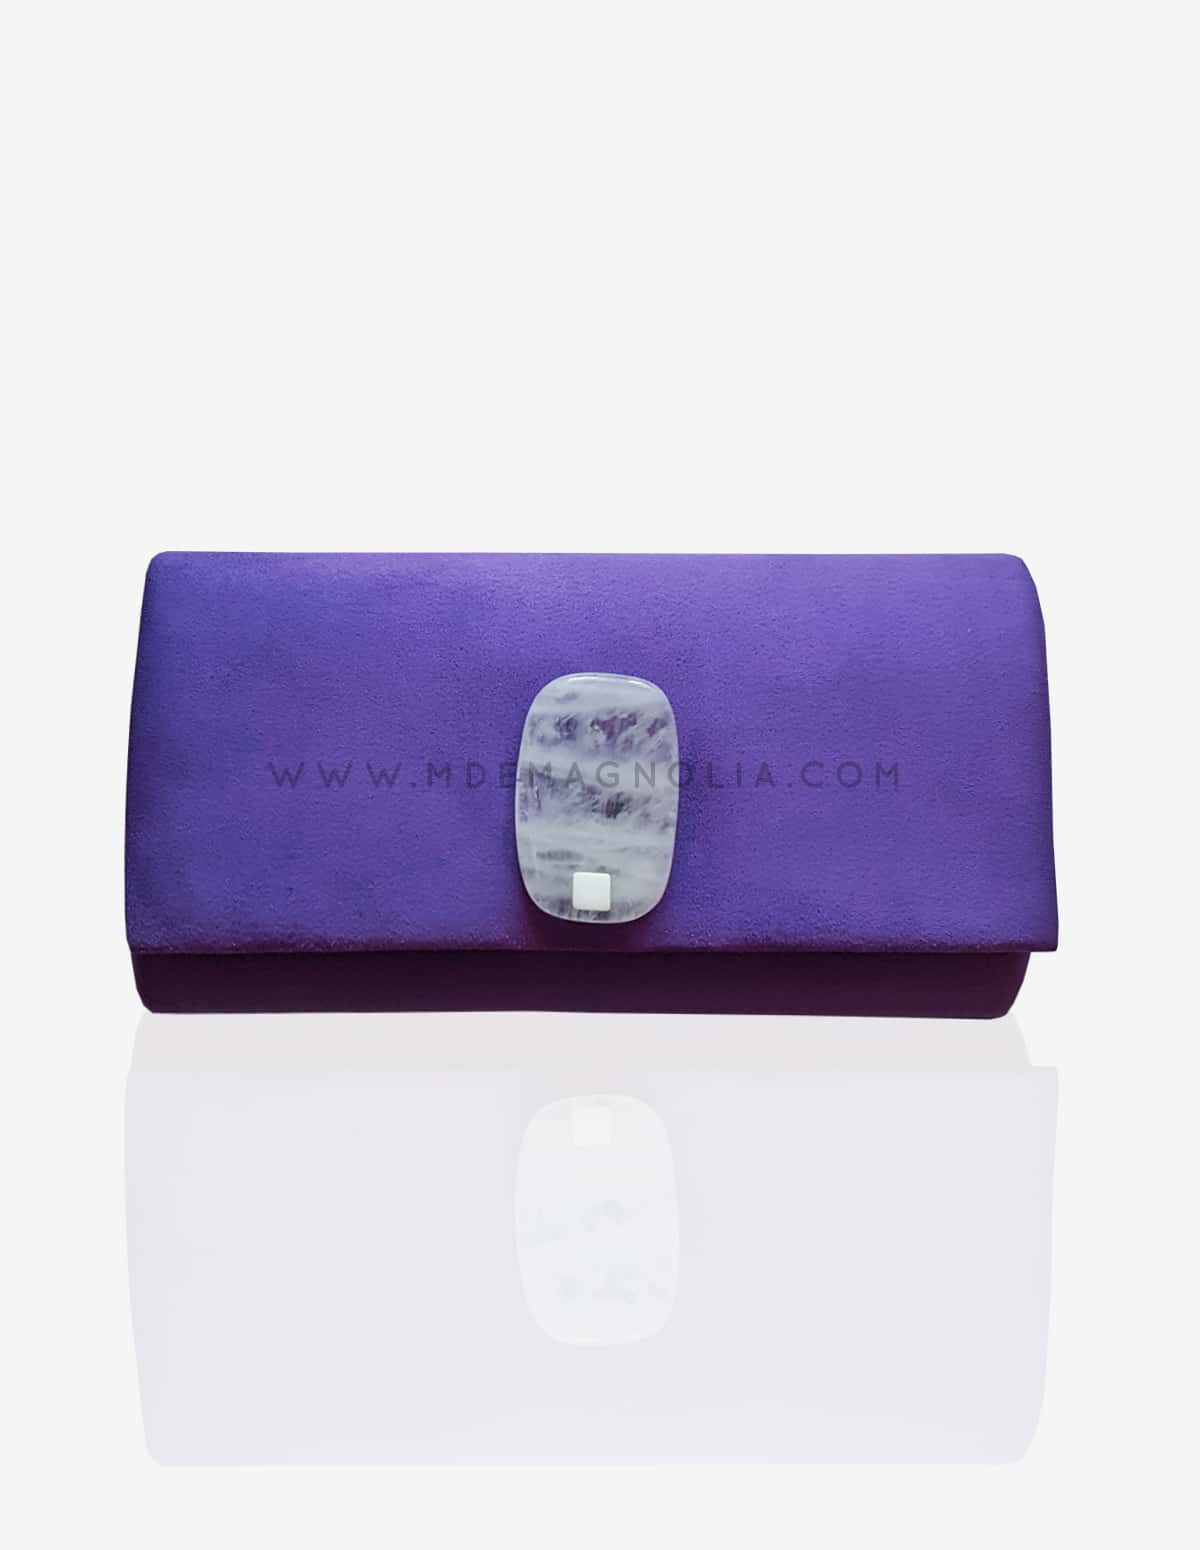 bolso morado con piedra blanca